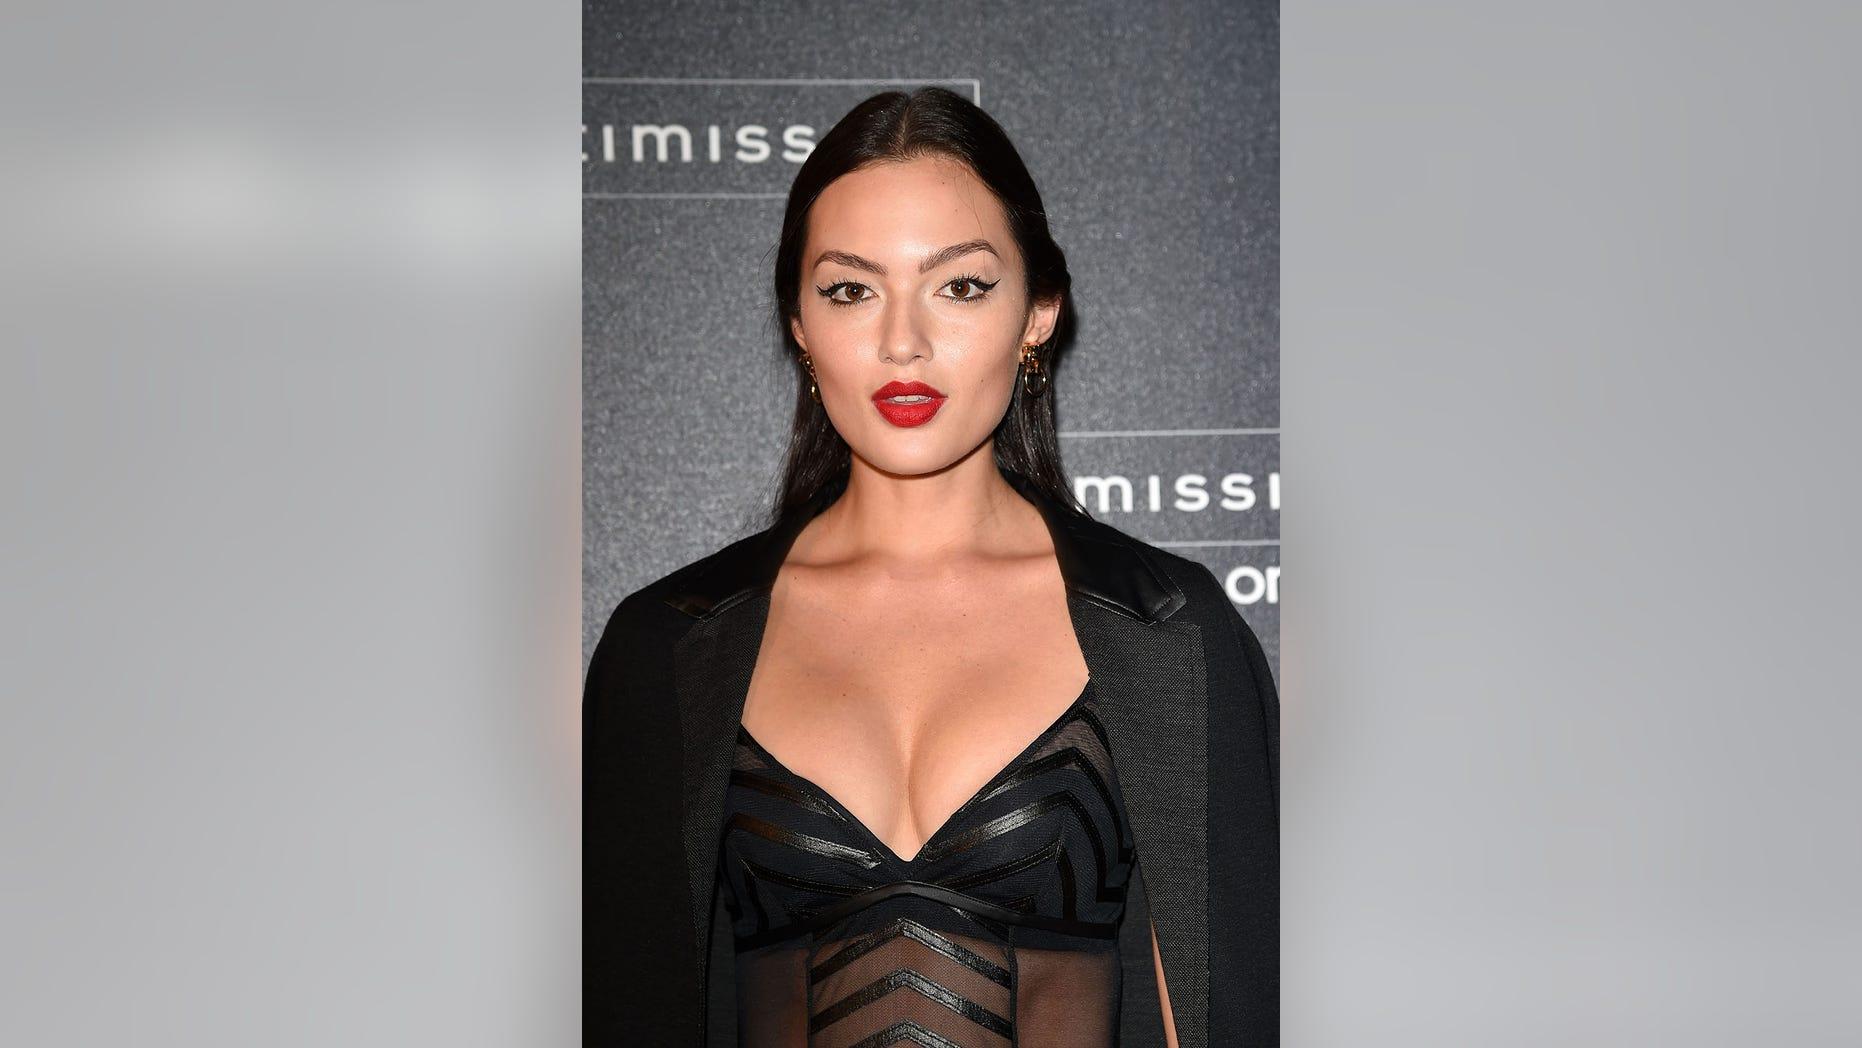 Sports Illustrated Swimsuit model Mia Kang